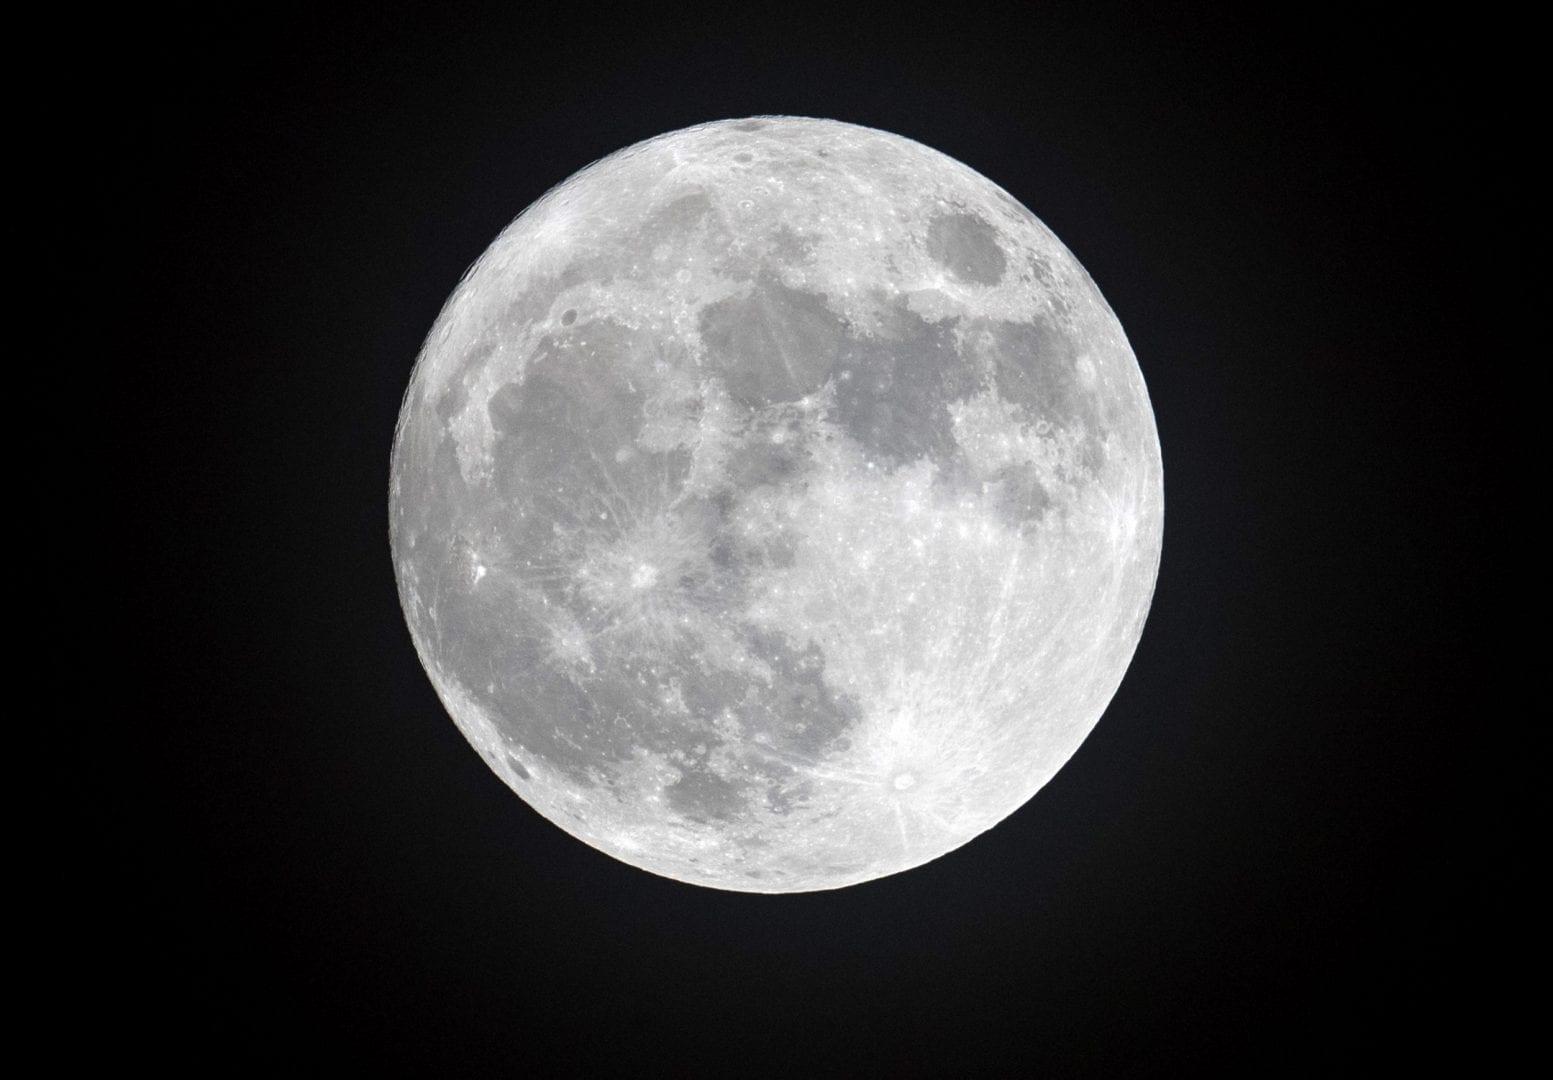 Lua - Fases do satélite natural da terra e curiosidades